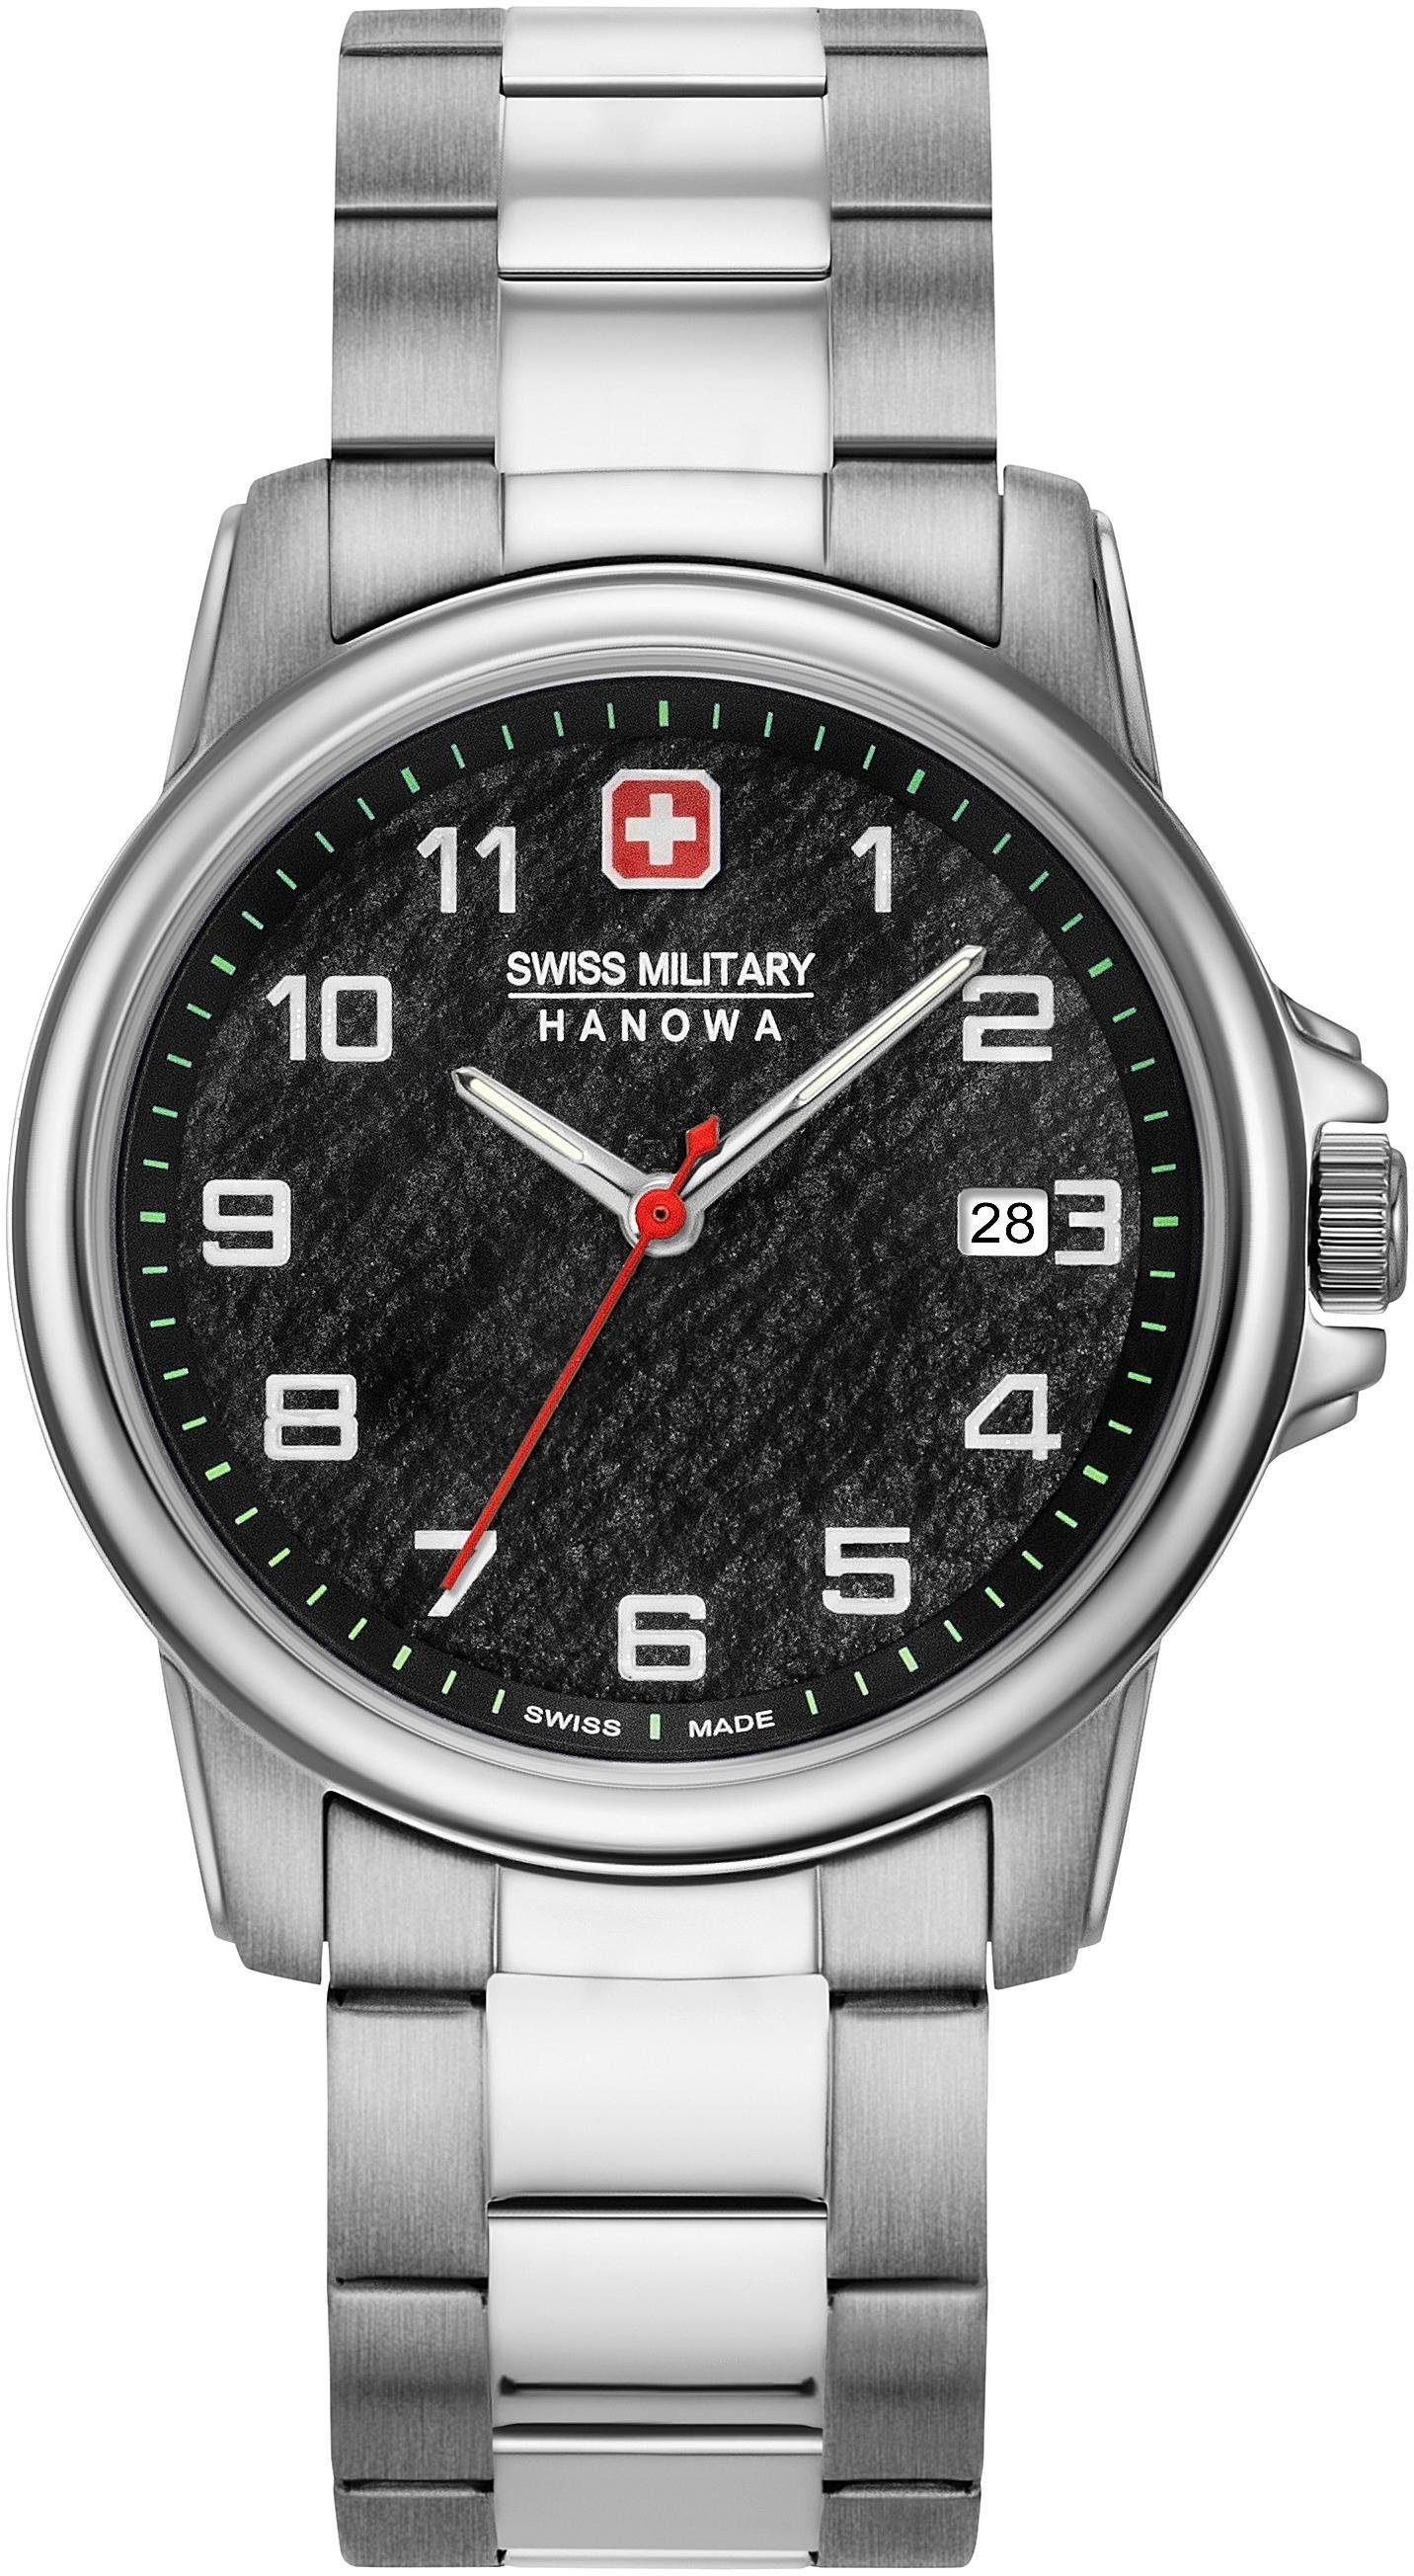 Swiss Military Hanowa Schweizer Uhr SWISS ROCK 06-523170400710 | Uhren > Schweizer Uhren | Swiss Military Hanowa